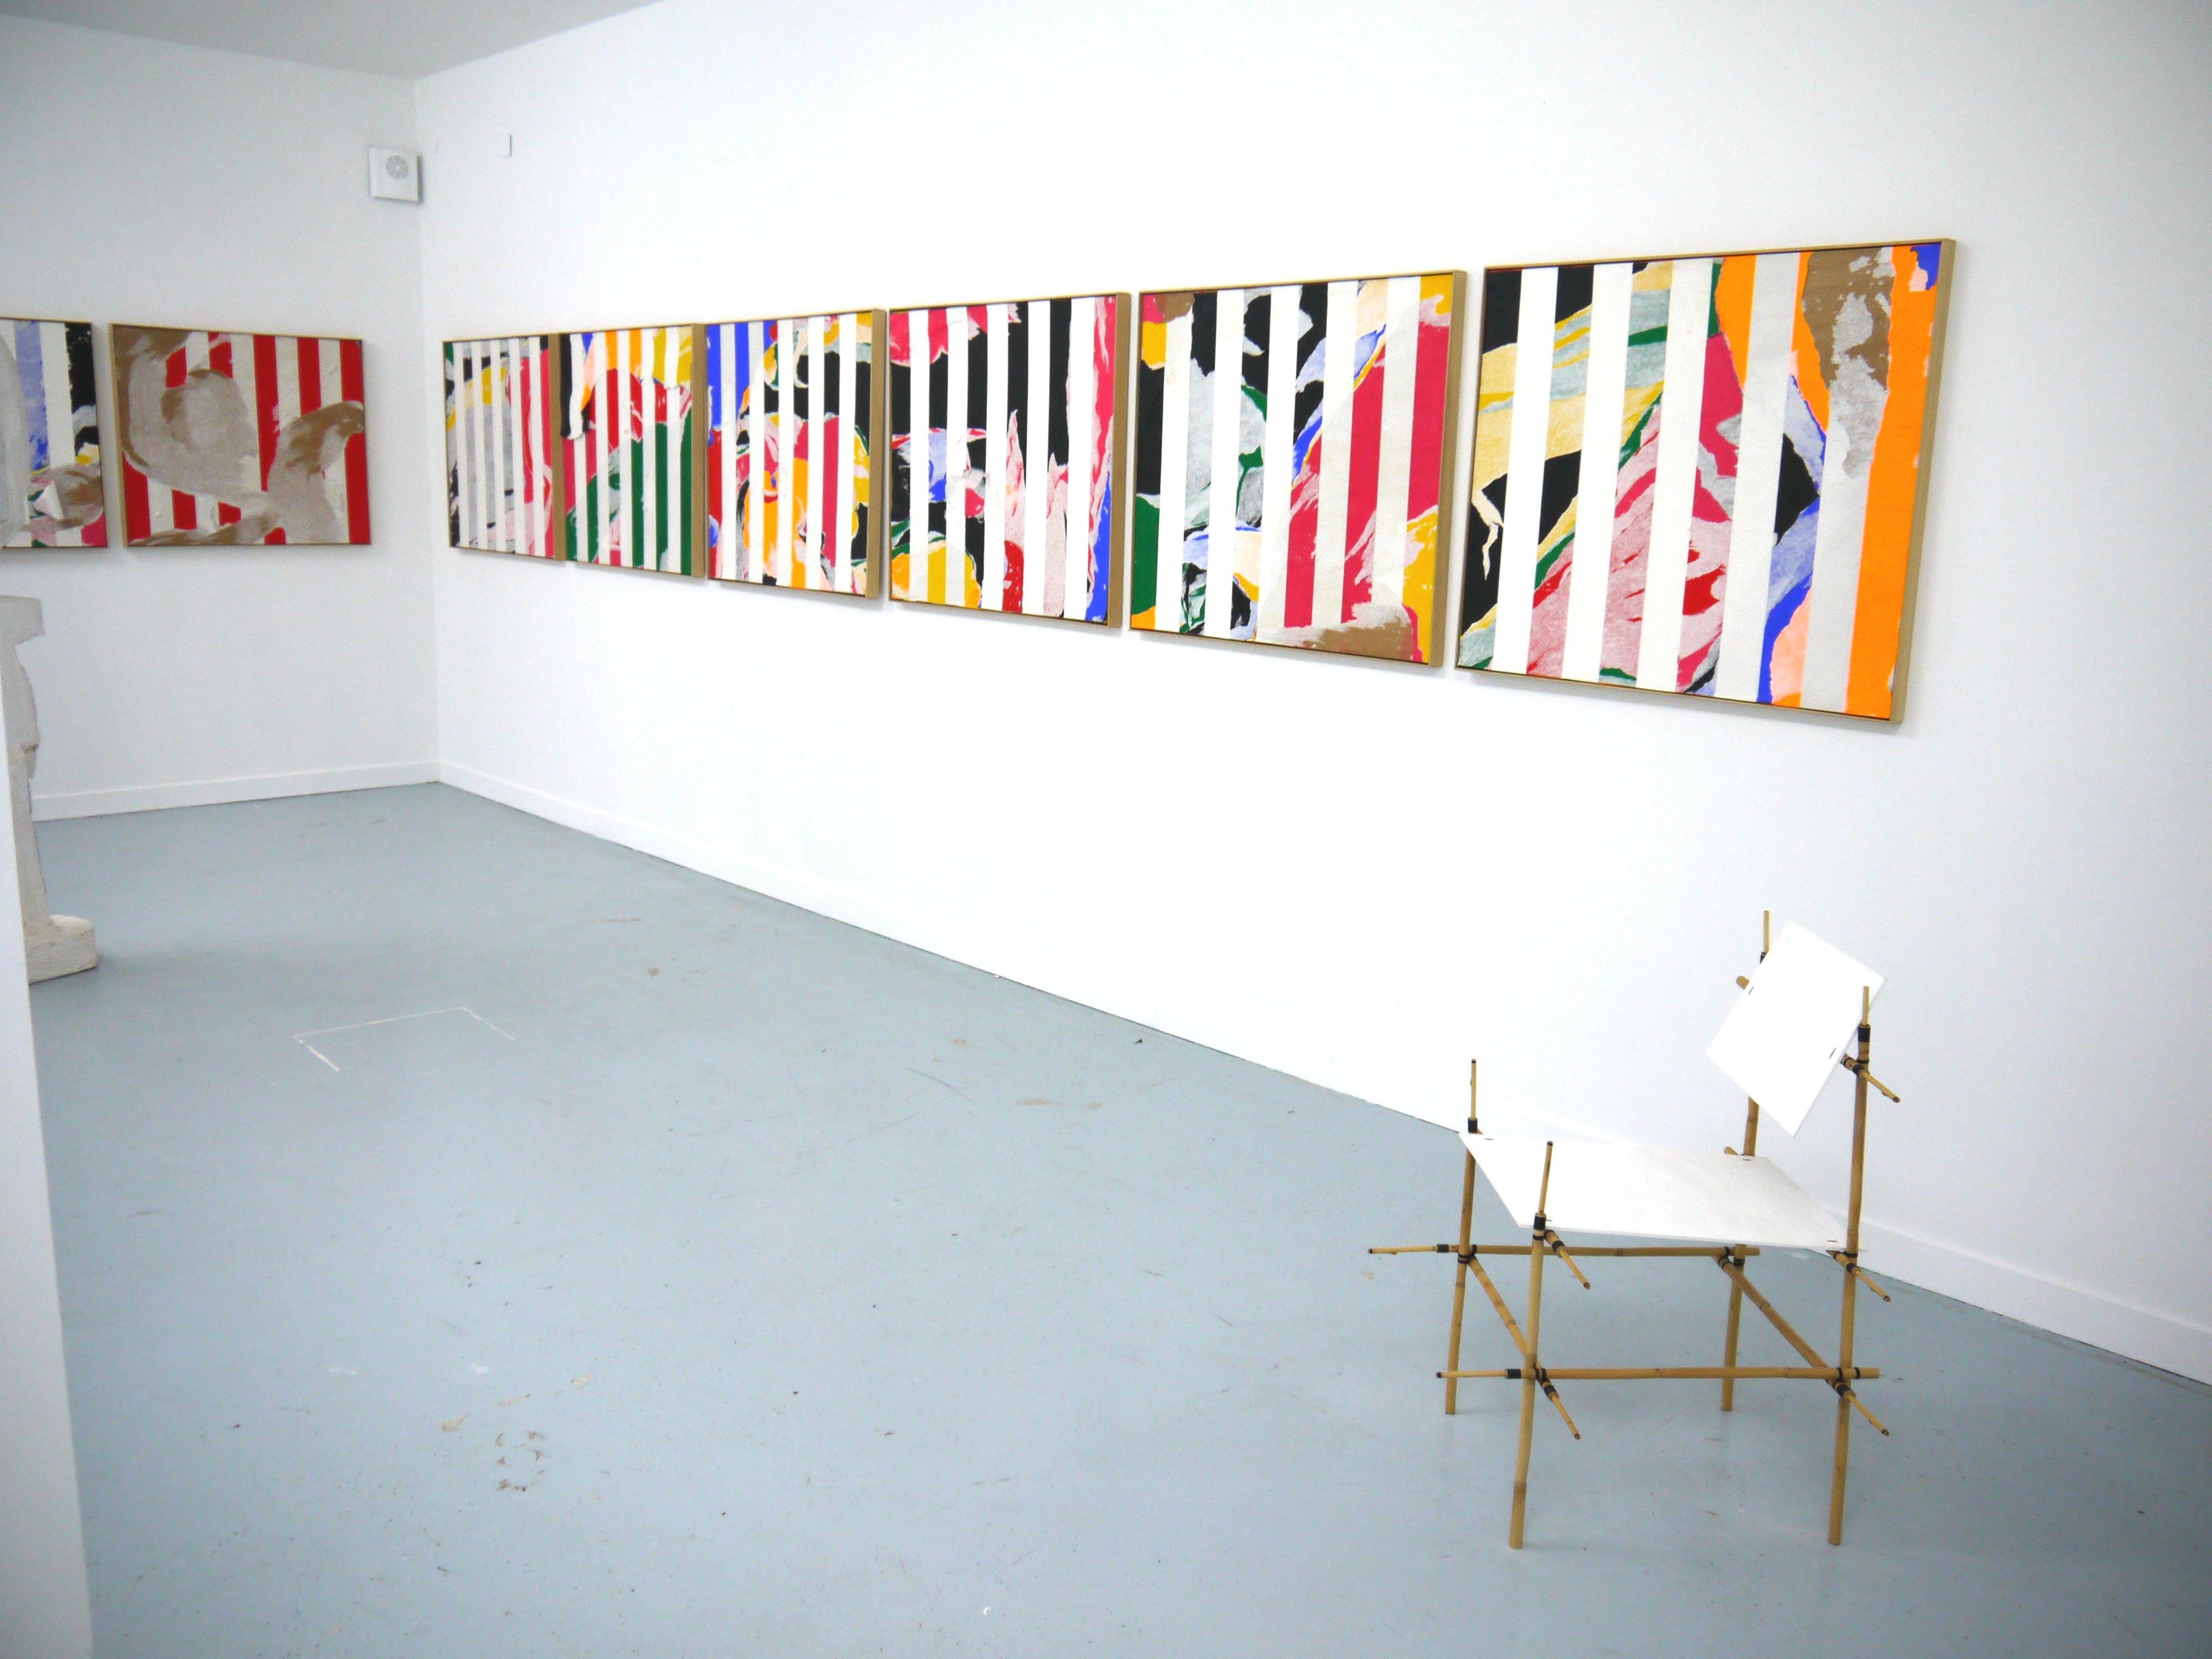 Frac Looping et boomerang Les Bains Douches Alençon art contemporain